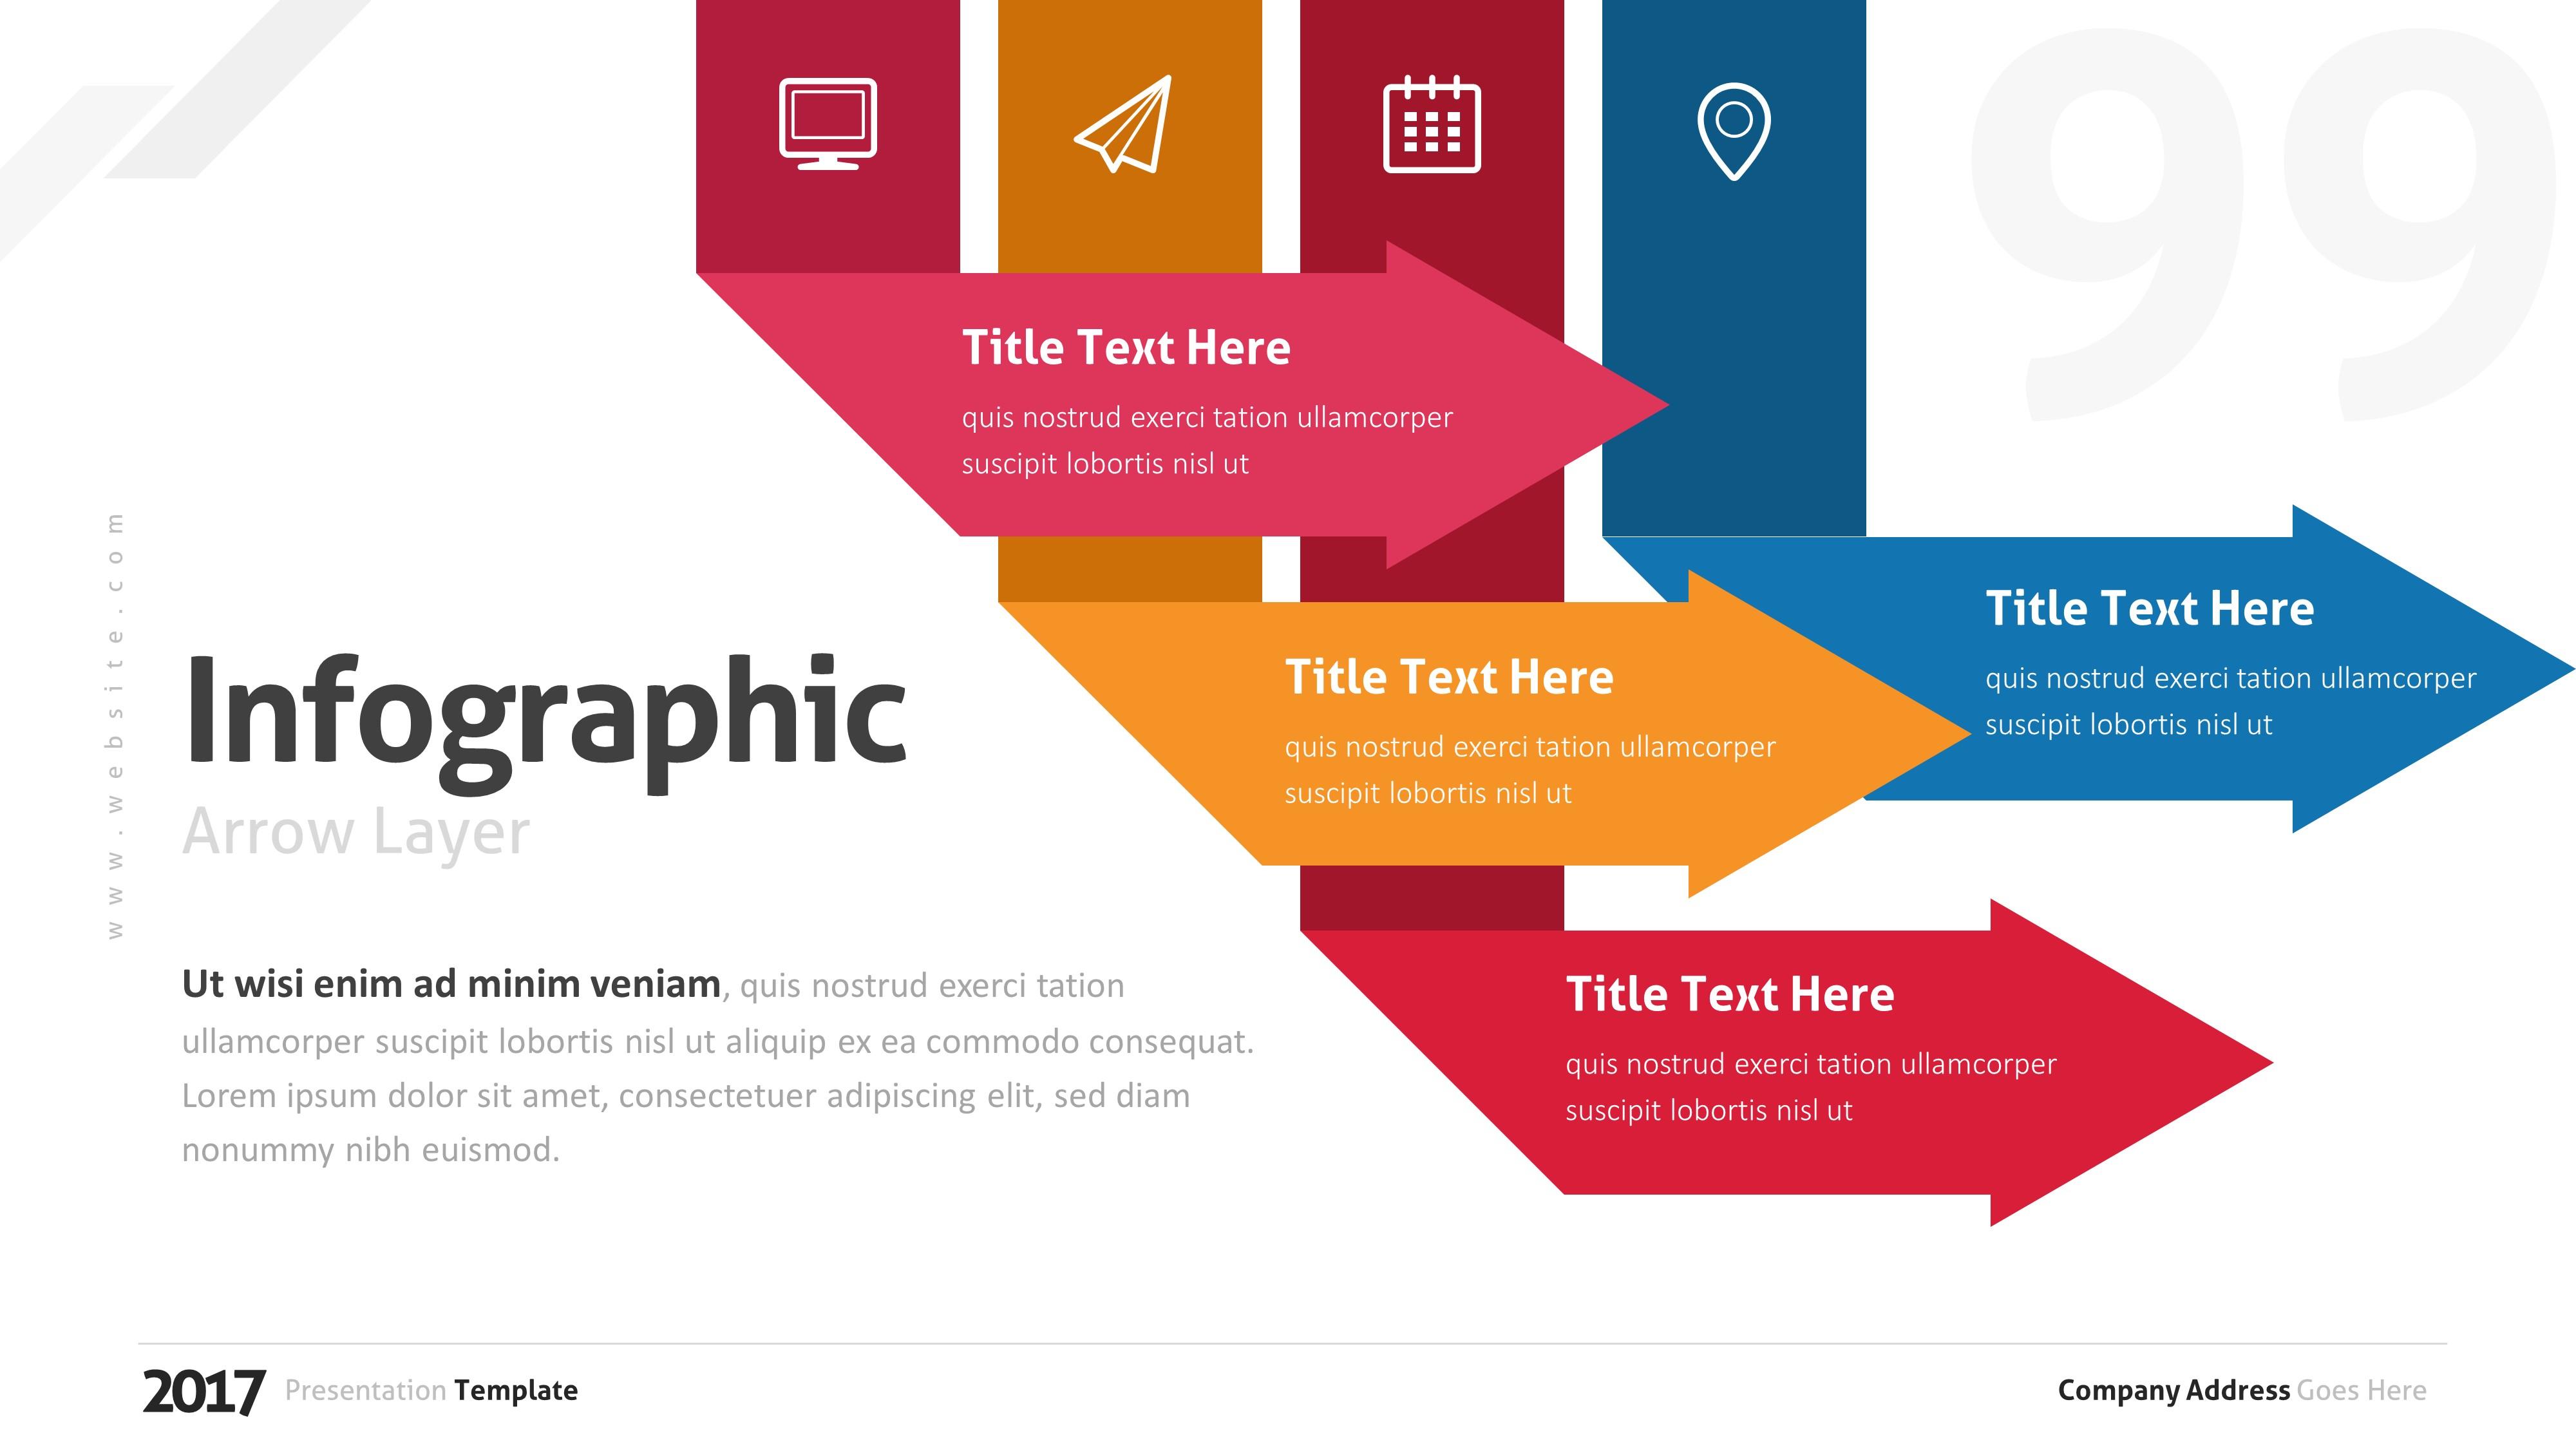 2017 project presentation templatebrandearth | graphicriver, Presentation templates